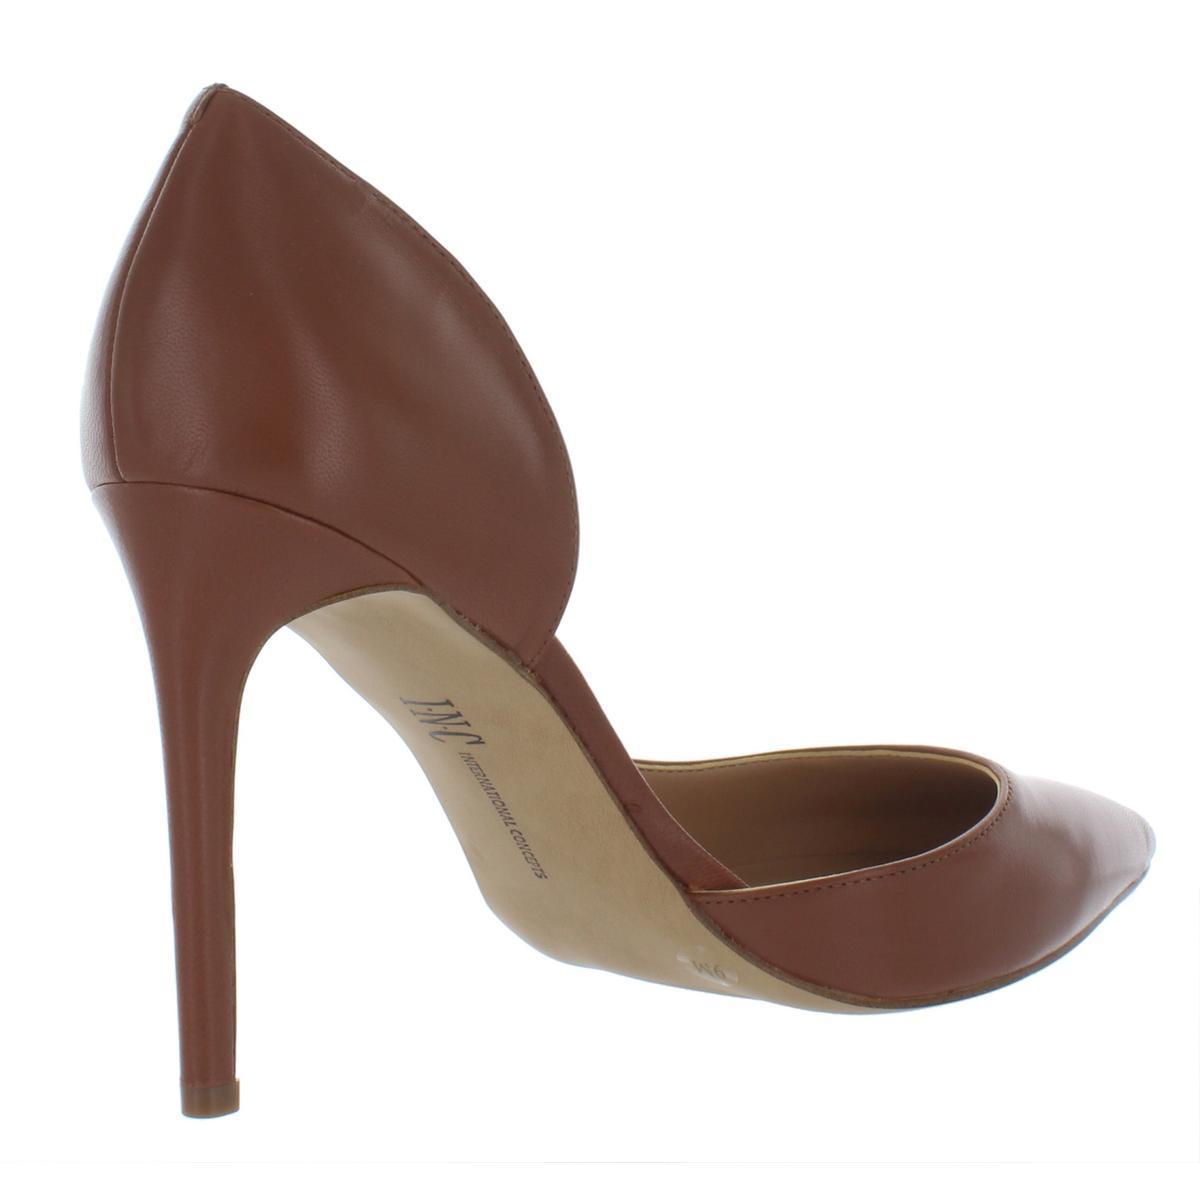 INC-Womens-Kenjay-Padded-Insole-Stiletto-Dress-D-039-Orsay-Heels-Shoes-BHFO-7446 thumbnail 9